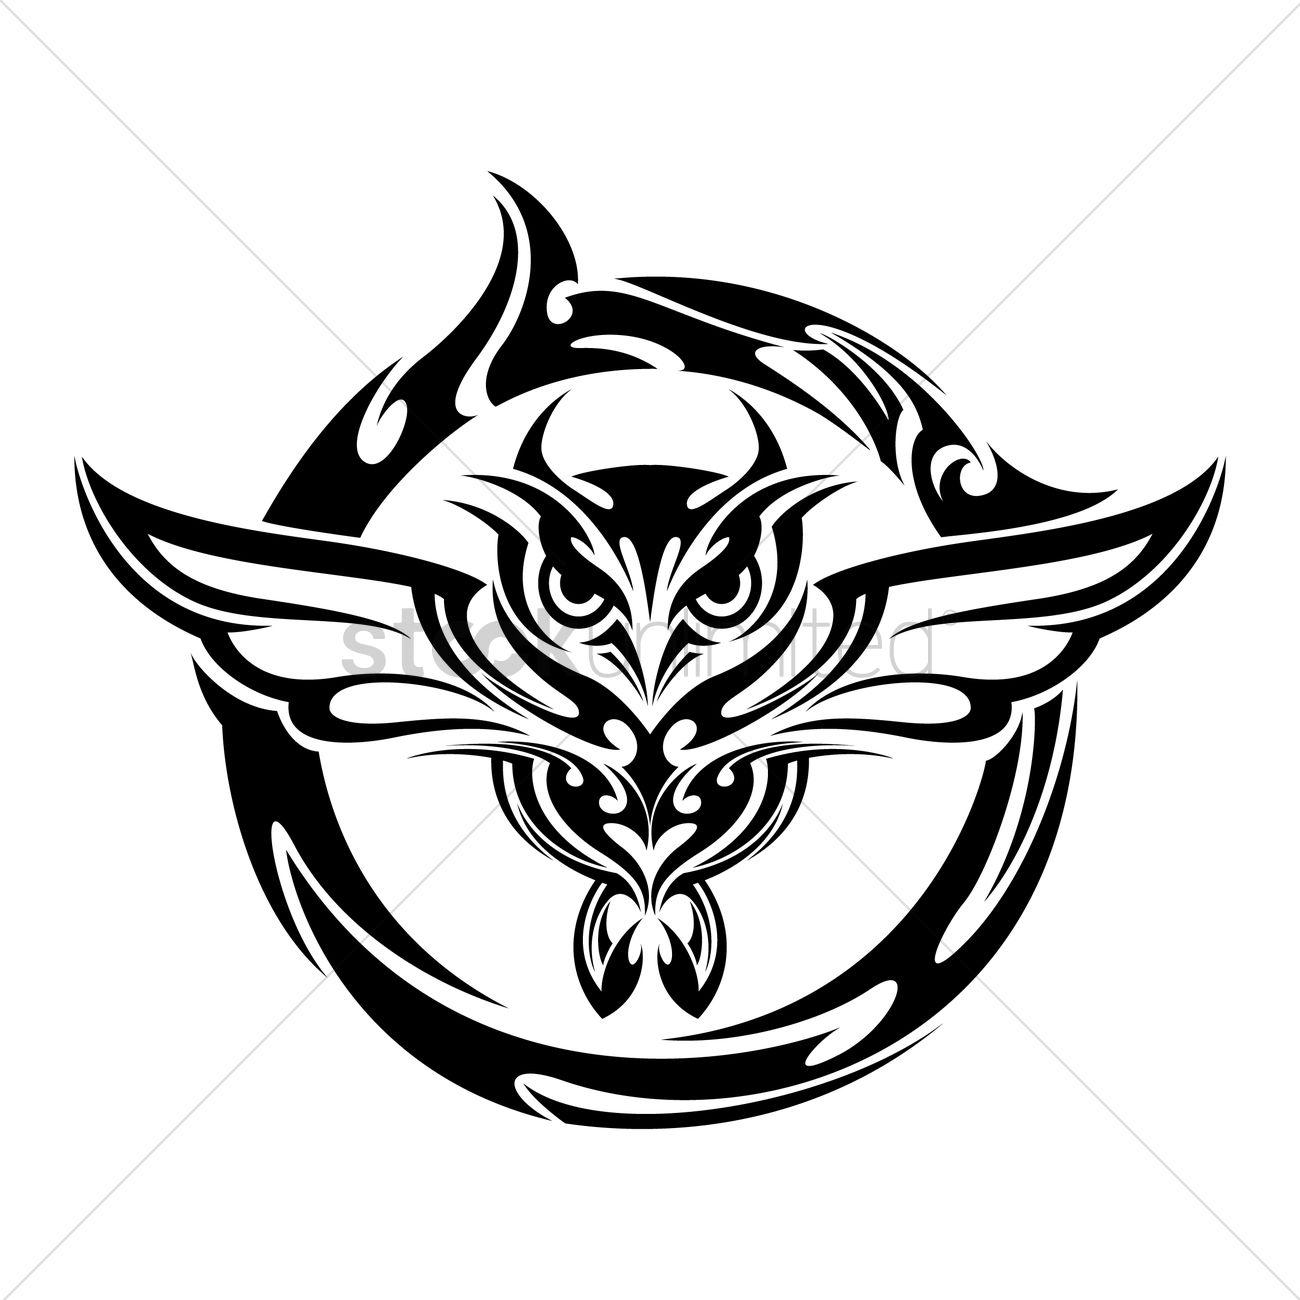 1300x1300 Owl Tattoo Vector Image